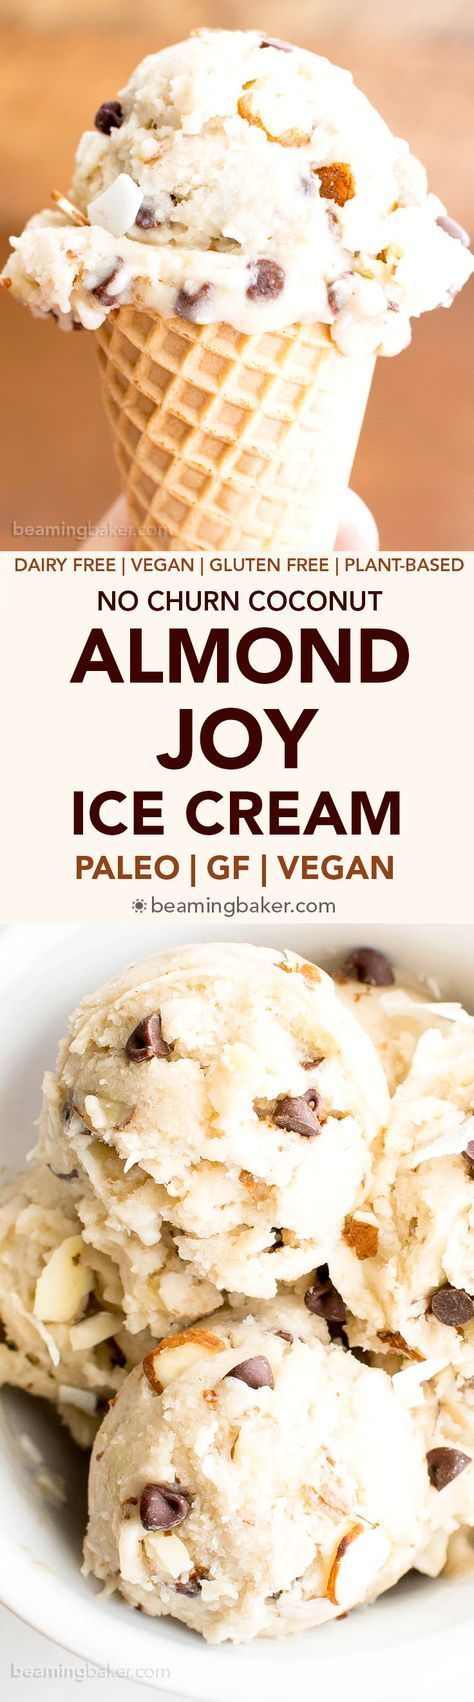 Paleo Vegan Almond Joy Ice Cream (V, GF): a 7 ingredient recipe for deliciously creamy, no churn ice cream bursting with coconut, chocolate and almonds. #Vegan #Paleo #DairyFree #GlutenFree